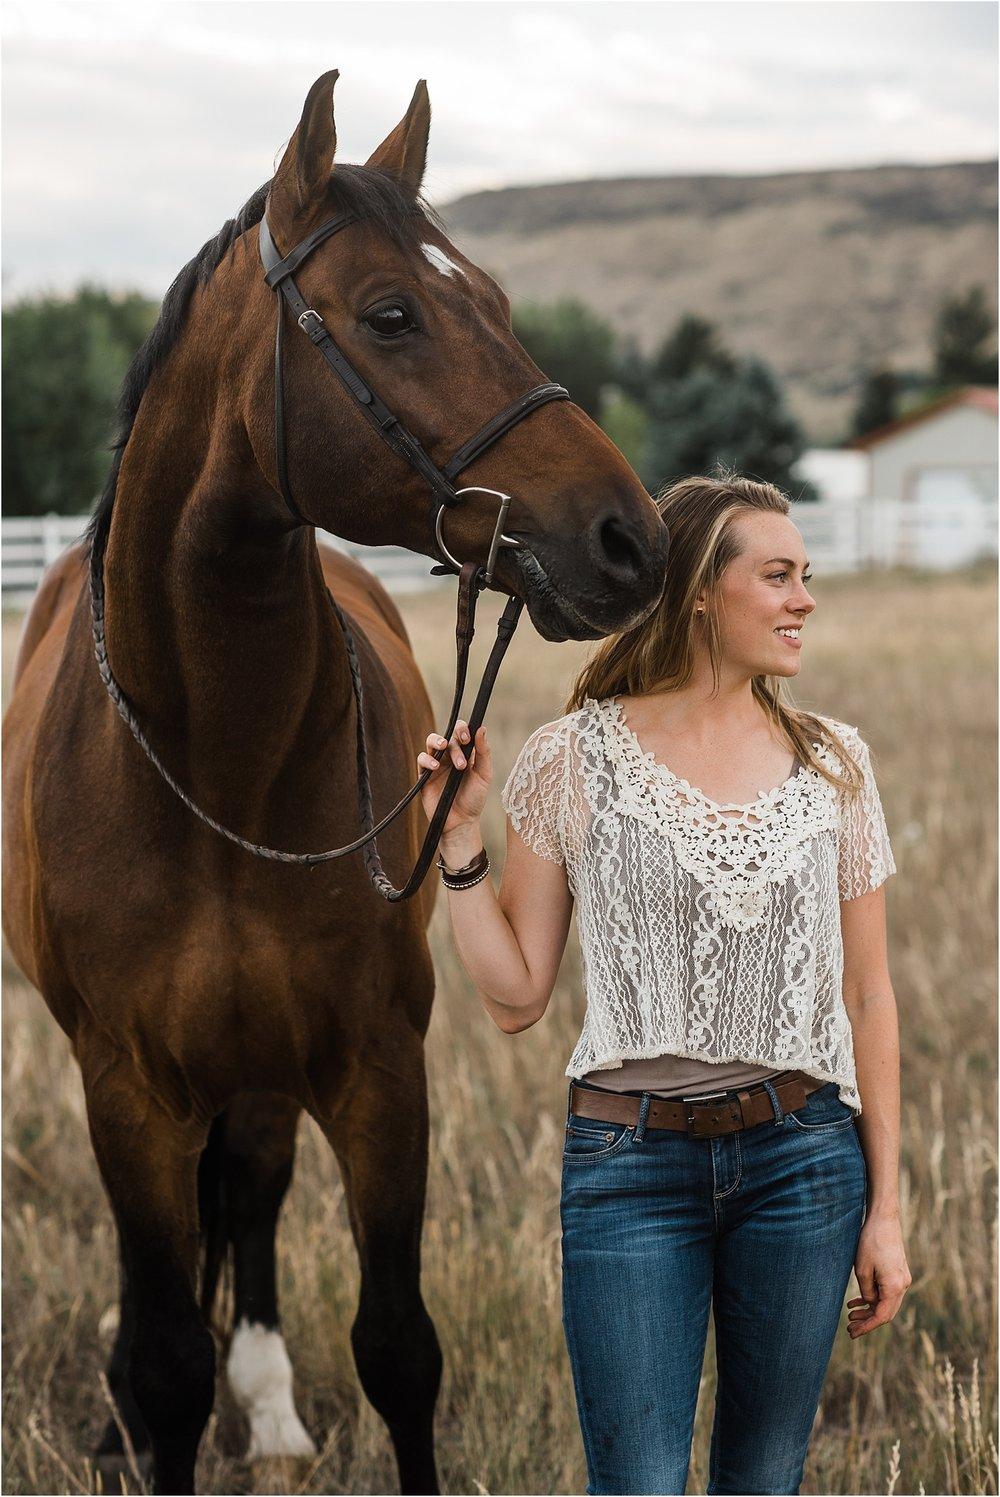 Limbo_Blog_Stomp_Horse_Photography_Equine_Warmblood_Portraits_024.jpg